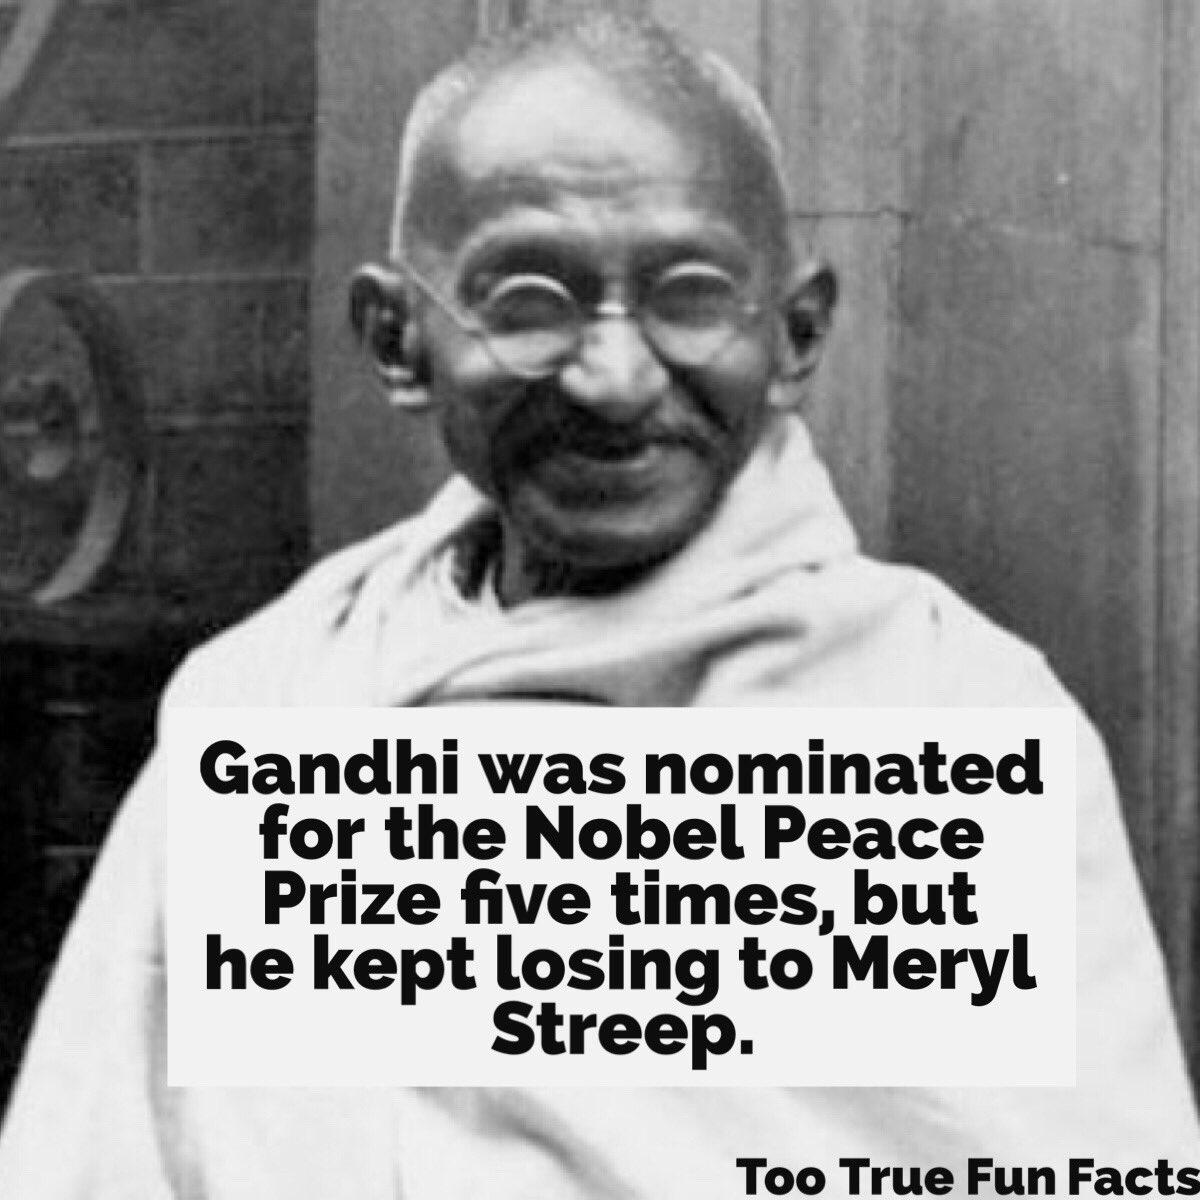 History Fun Fact. #History #historic #historical #HistoryMakers #Gandhi #MerylStreep #actor #comedy #funny #meme #memes #parody #satire<br>http://pic.twitter.com/ZliTTGTXV5